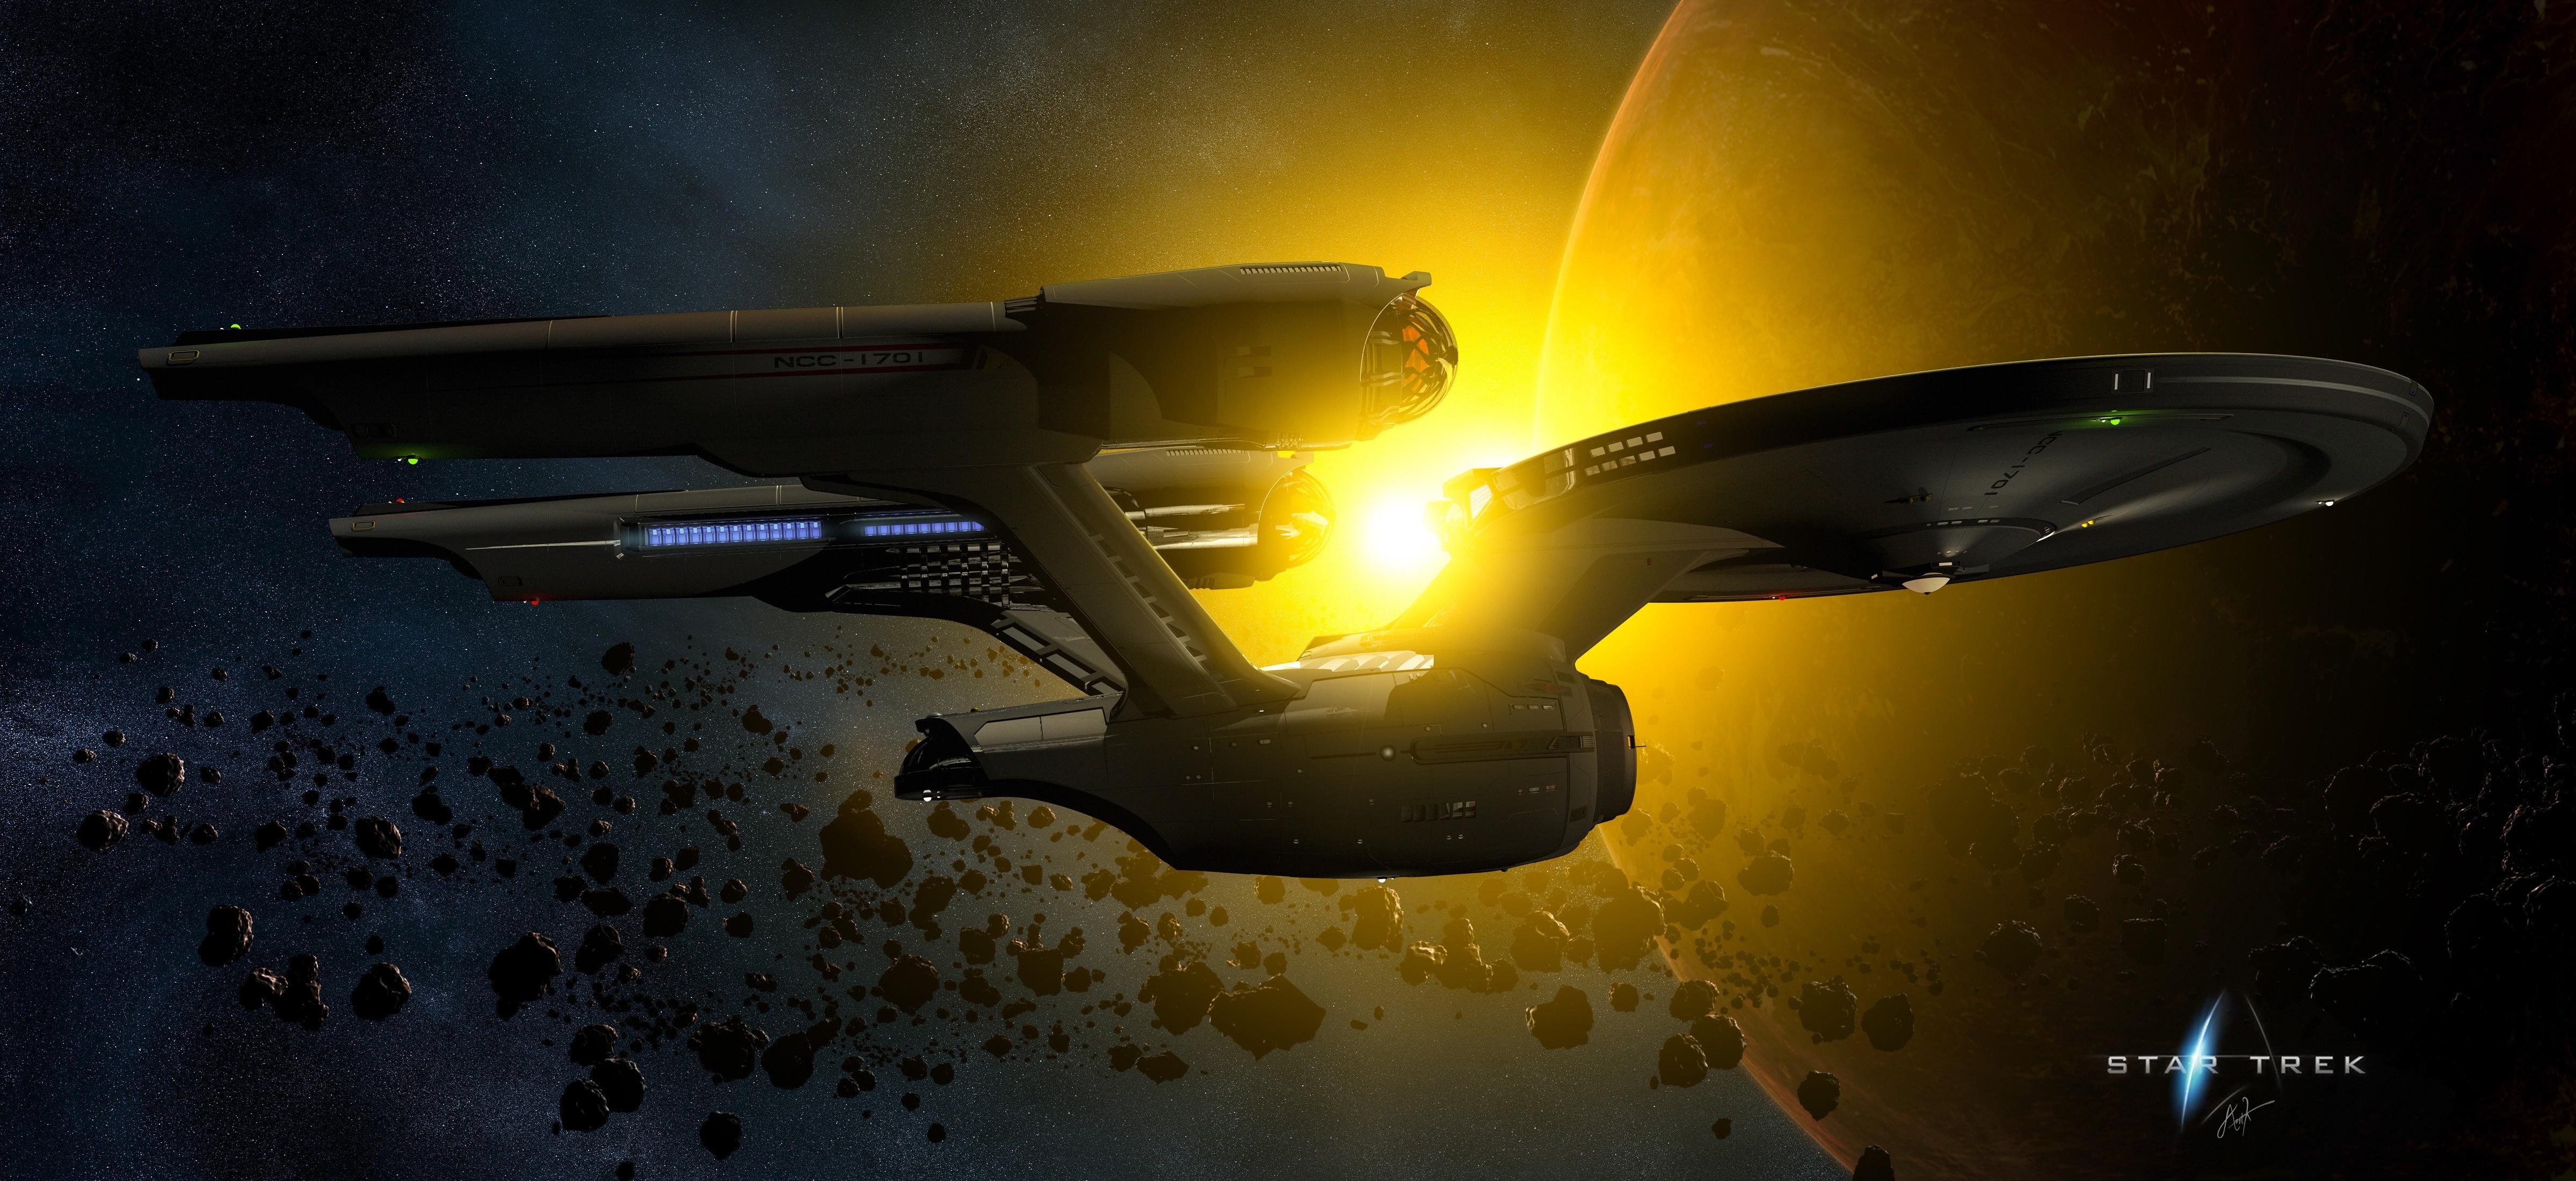 Enterprise Uss Enterprise Star Trek Tos , HD Wallpaper & Backgrounds